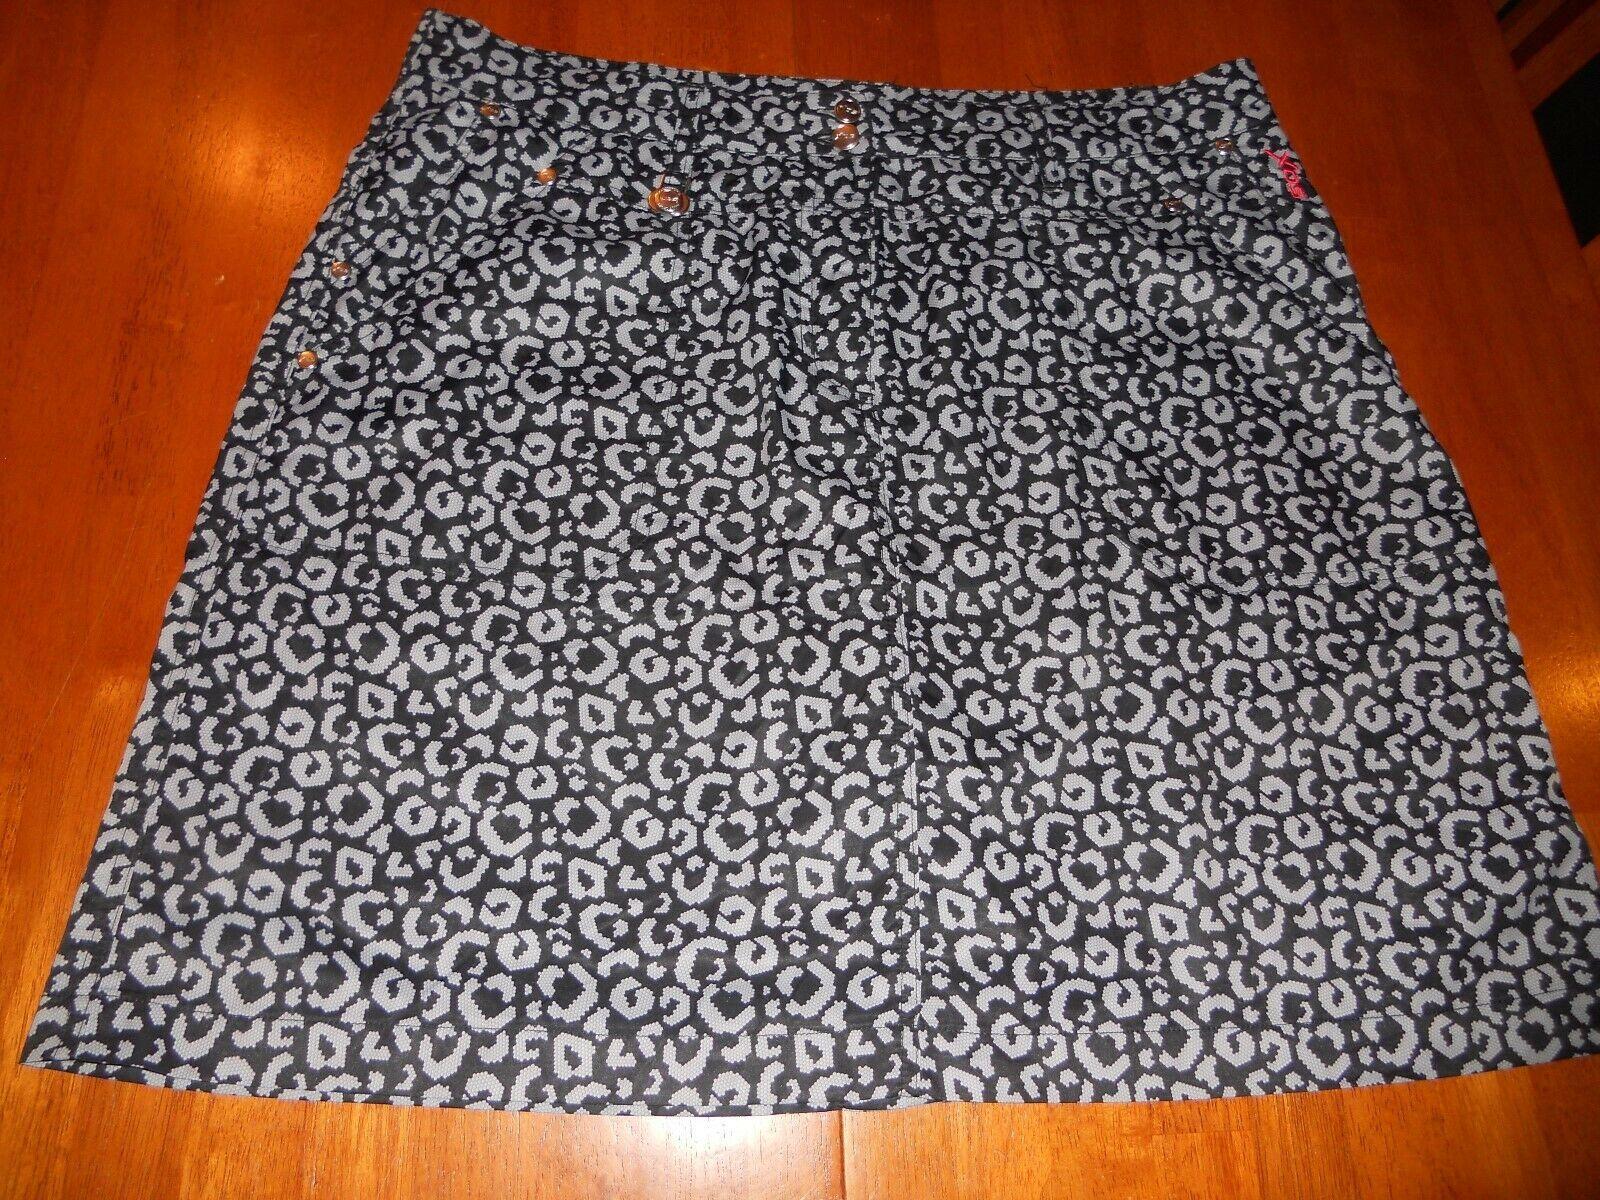 Daily Sports womens golf skirt skort size 16 MINT cond